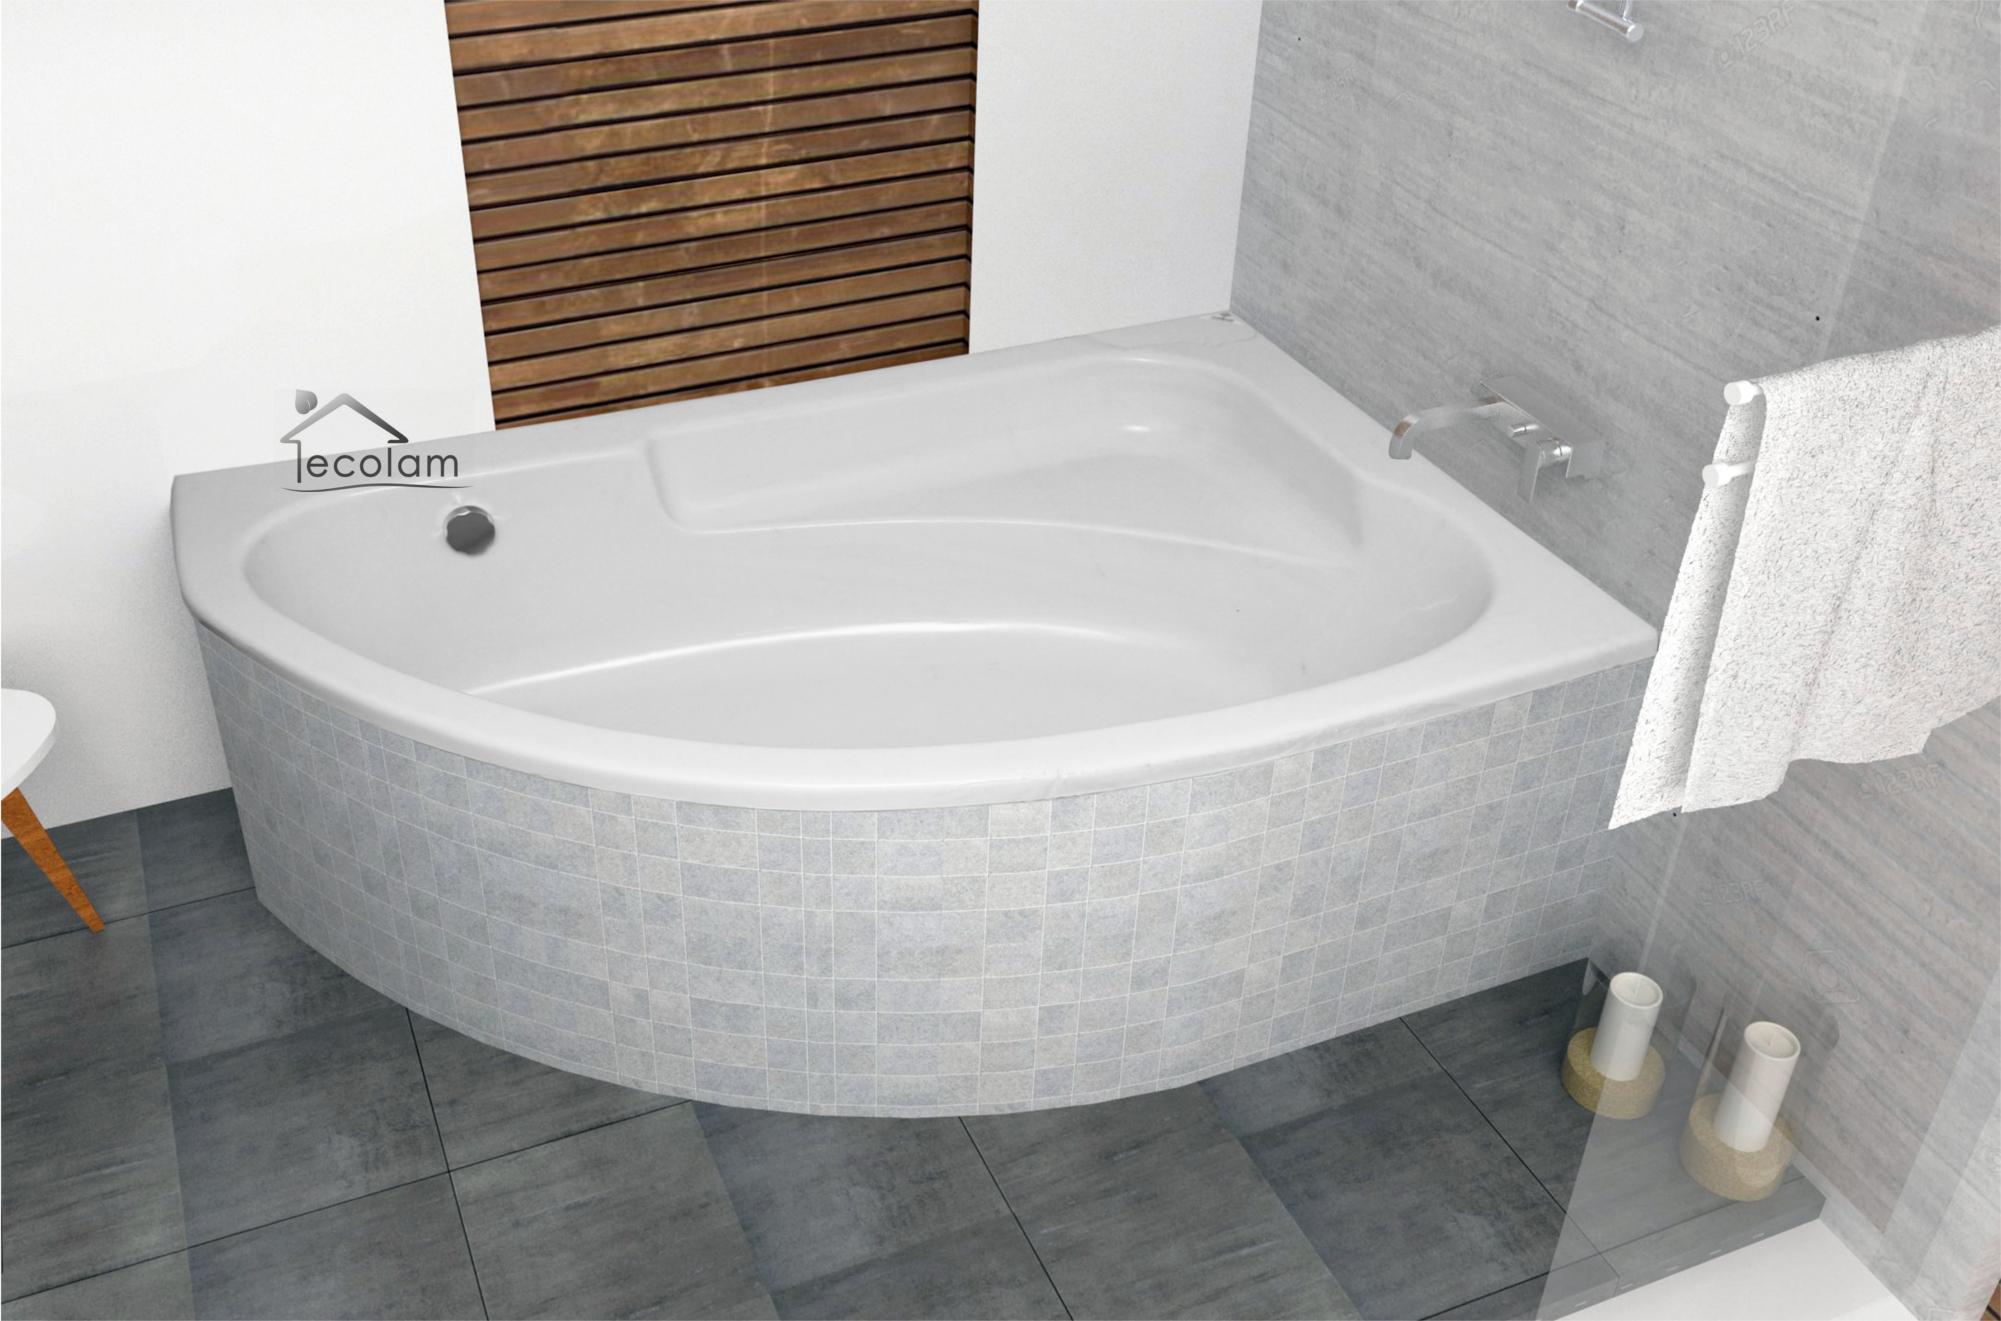 badewanne eckbadewanne acryl 150 x 100 cm ab berlauf. Black Bedroom Furniture Sets. Home Design Ideas